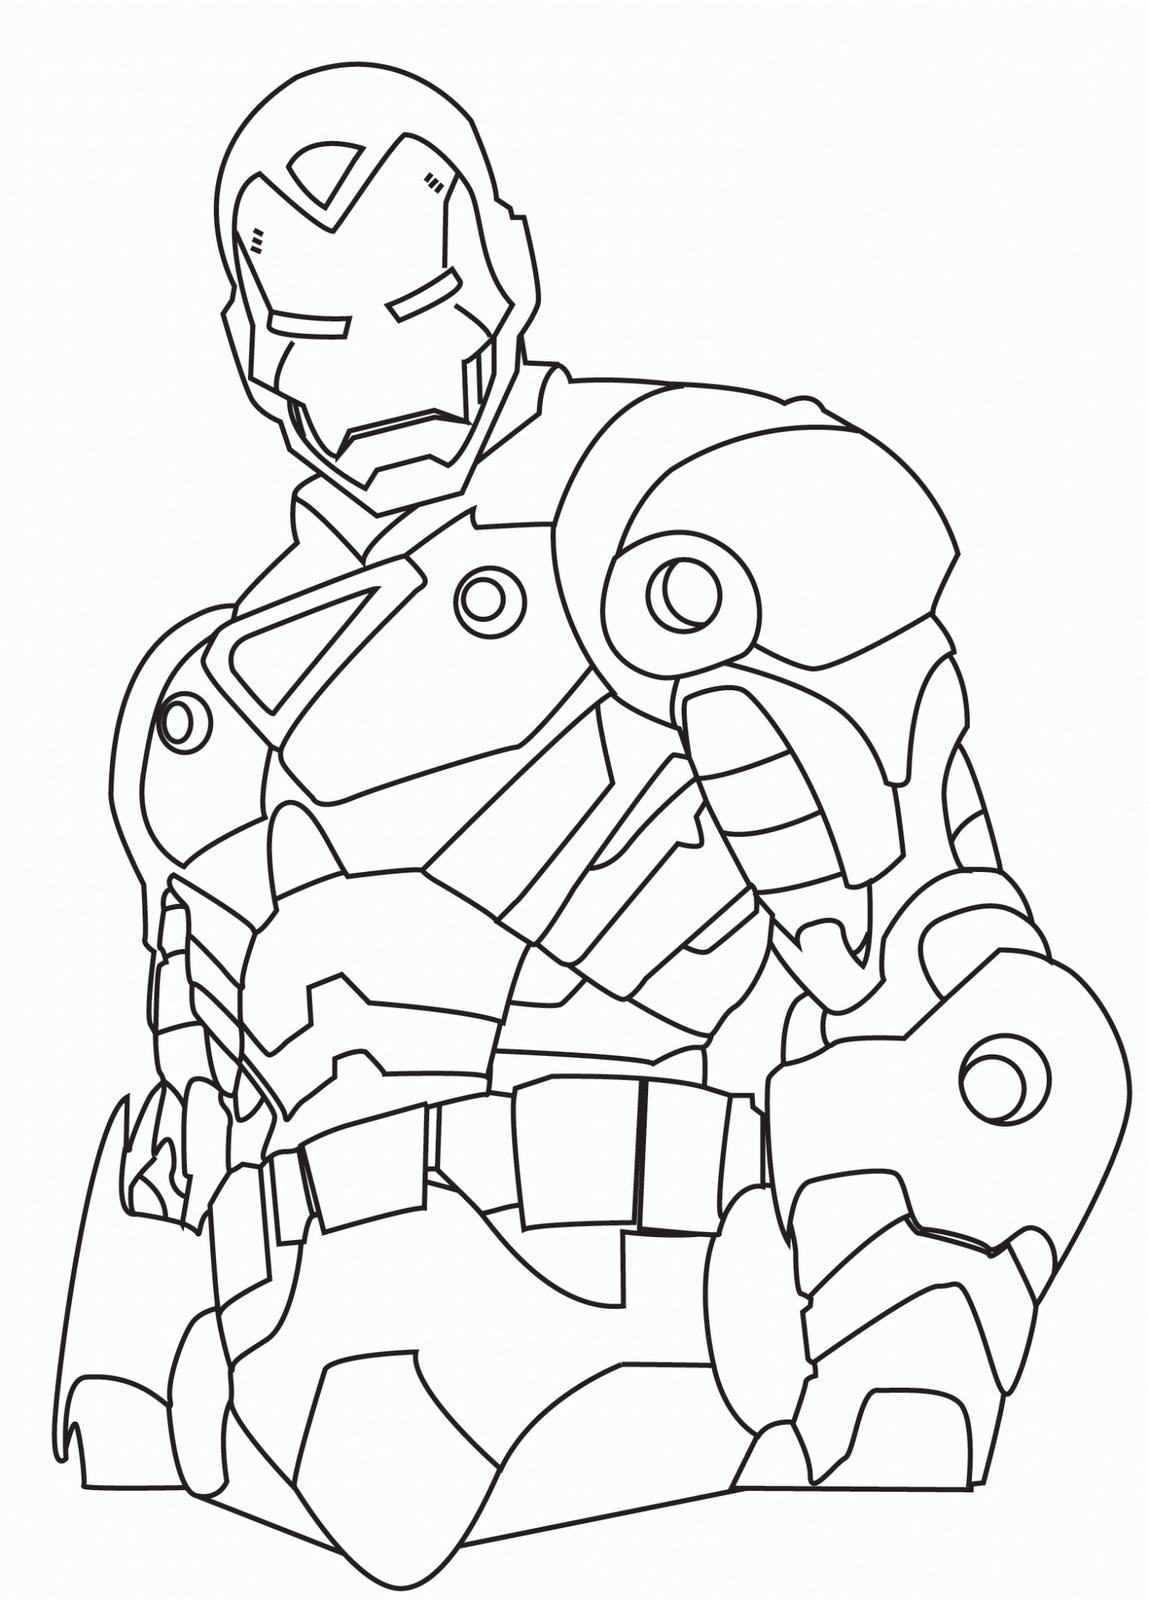 colorear-iron-man-2-5-dibujos-infantiles.png 1,150×1,600 pixels ...